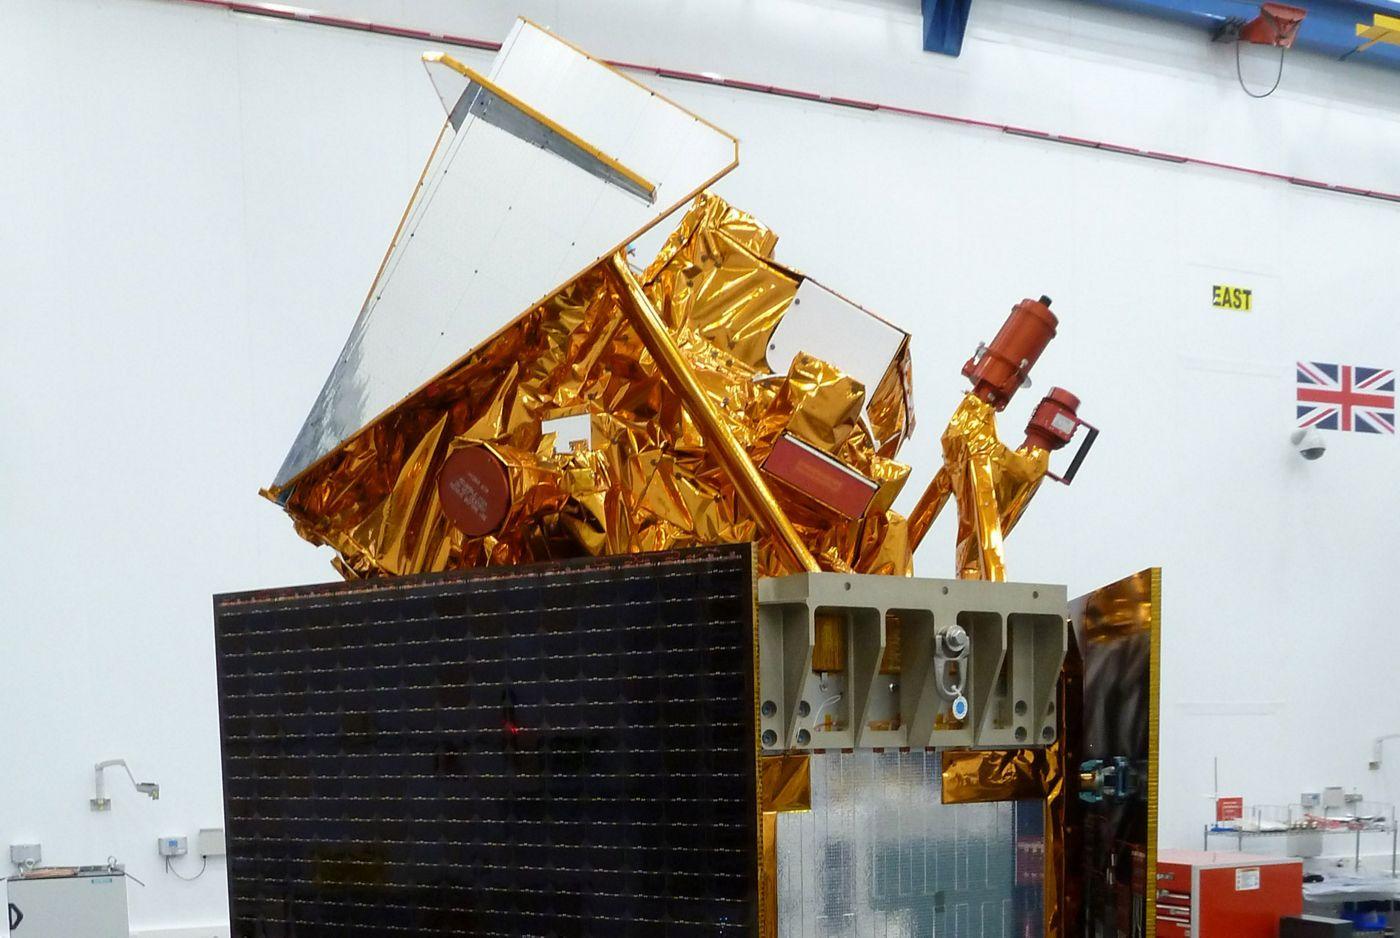 Airbus-built Sentinel-5 Precursor satellite ready for launch